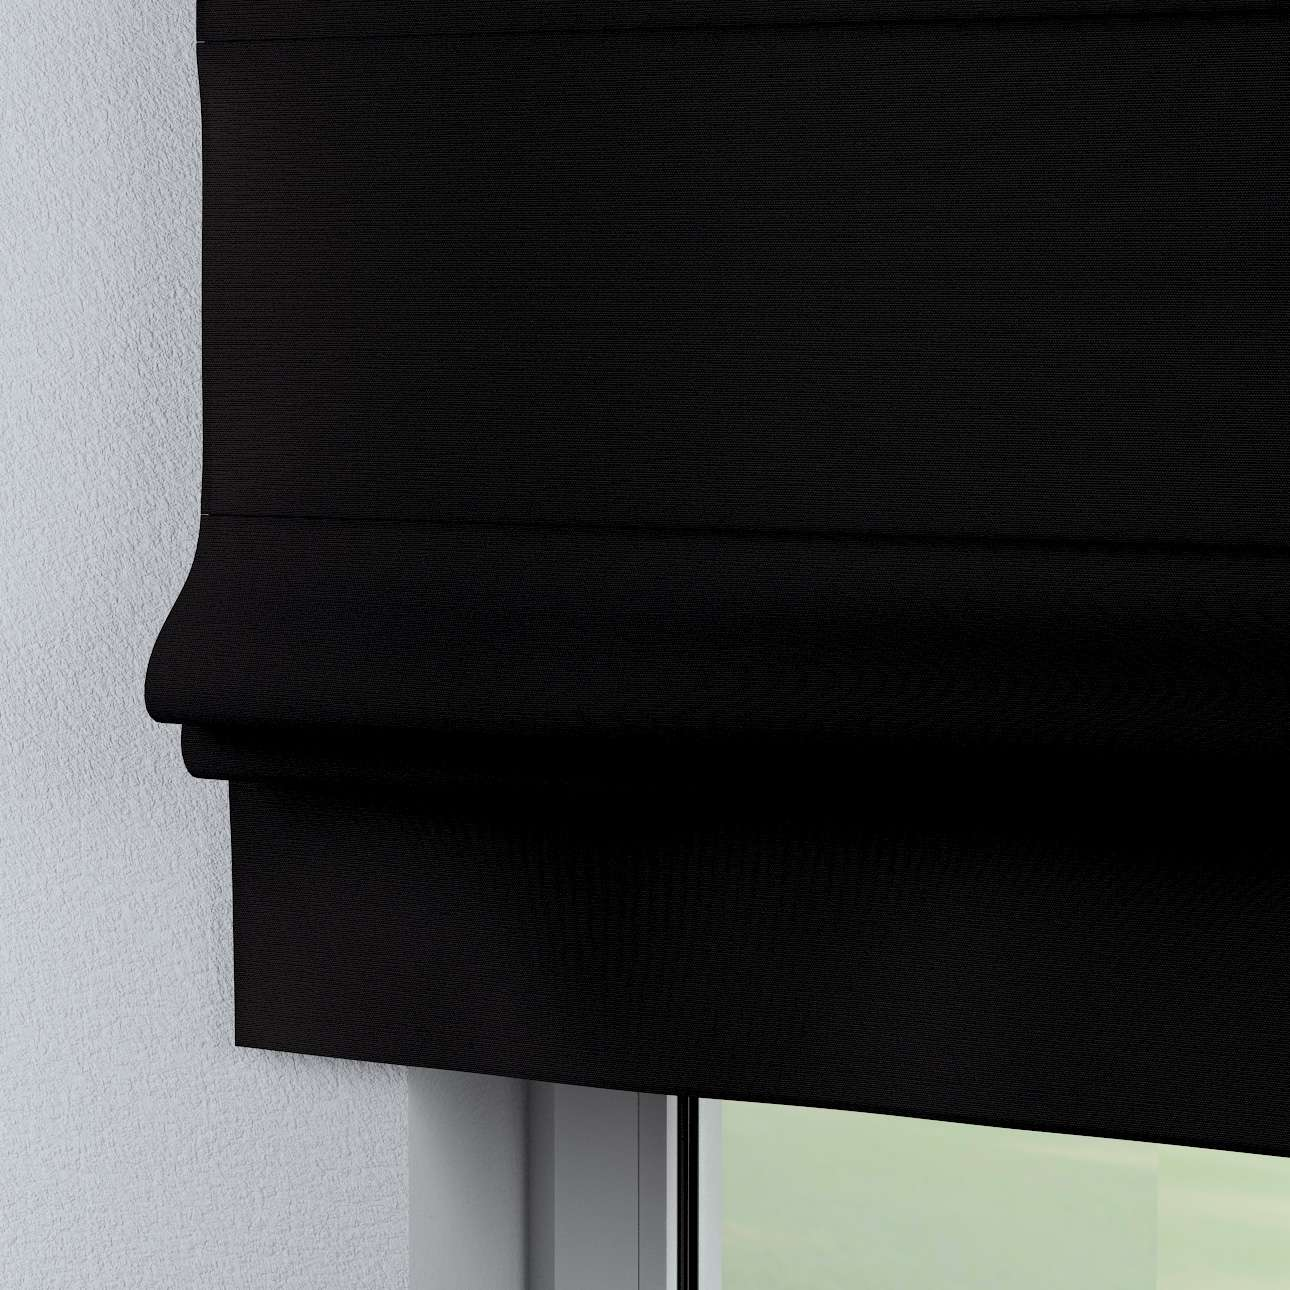 Rímska roleta Padva 80 x 170 cm V kolekcii Cotton Panama, tkanina: 702-08